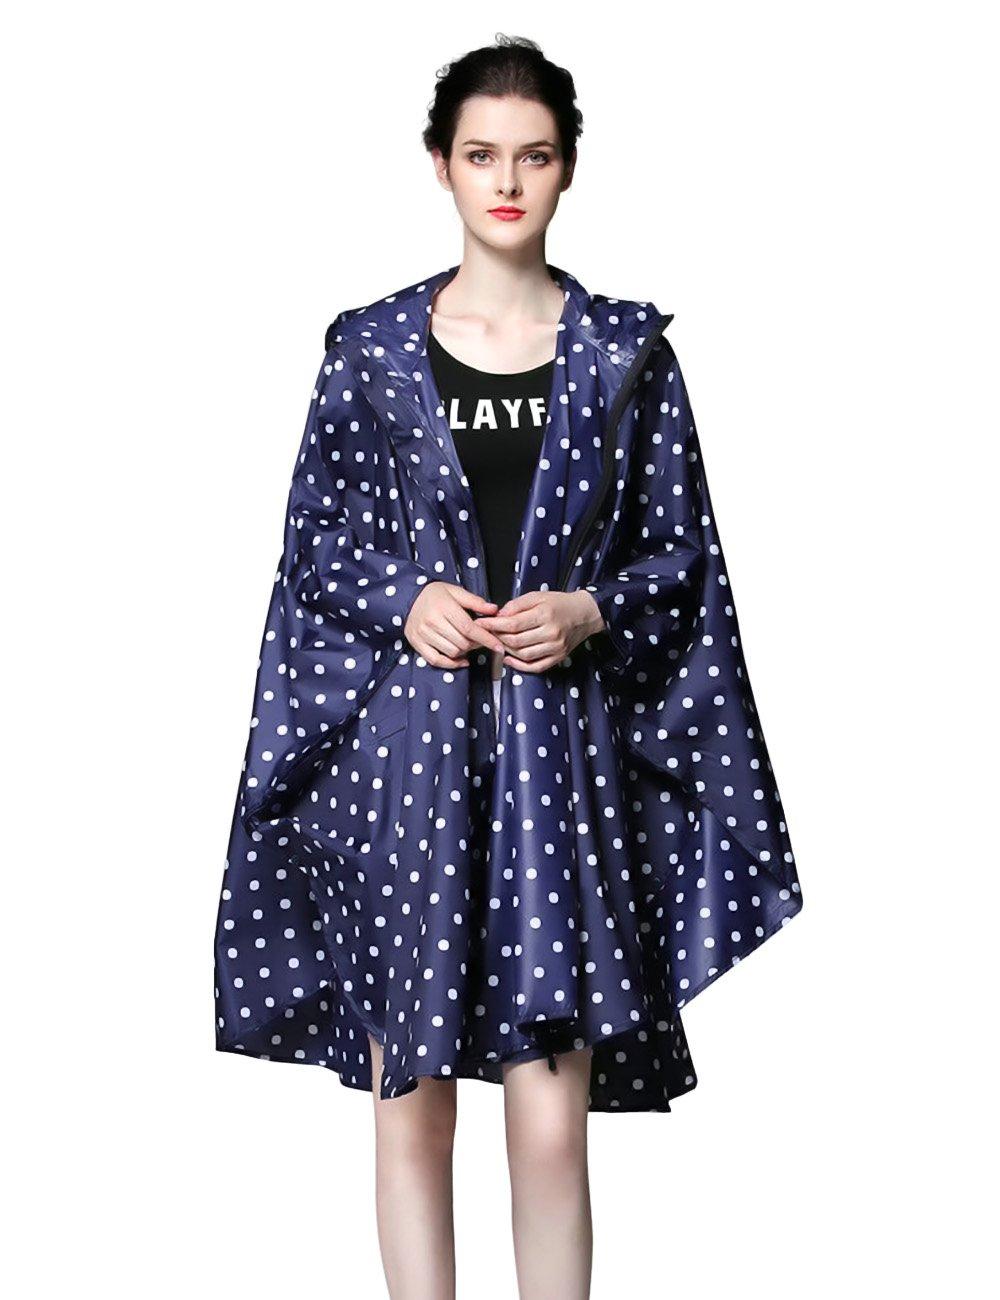 Walsilk Women's Travel Rain Poncho Batwing-Sleeved Hooded Raincoat,Waterproof Rain Jacket with Pockets,Showerproof Poncho Rain Coat Slicker for Emergency